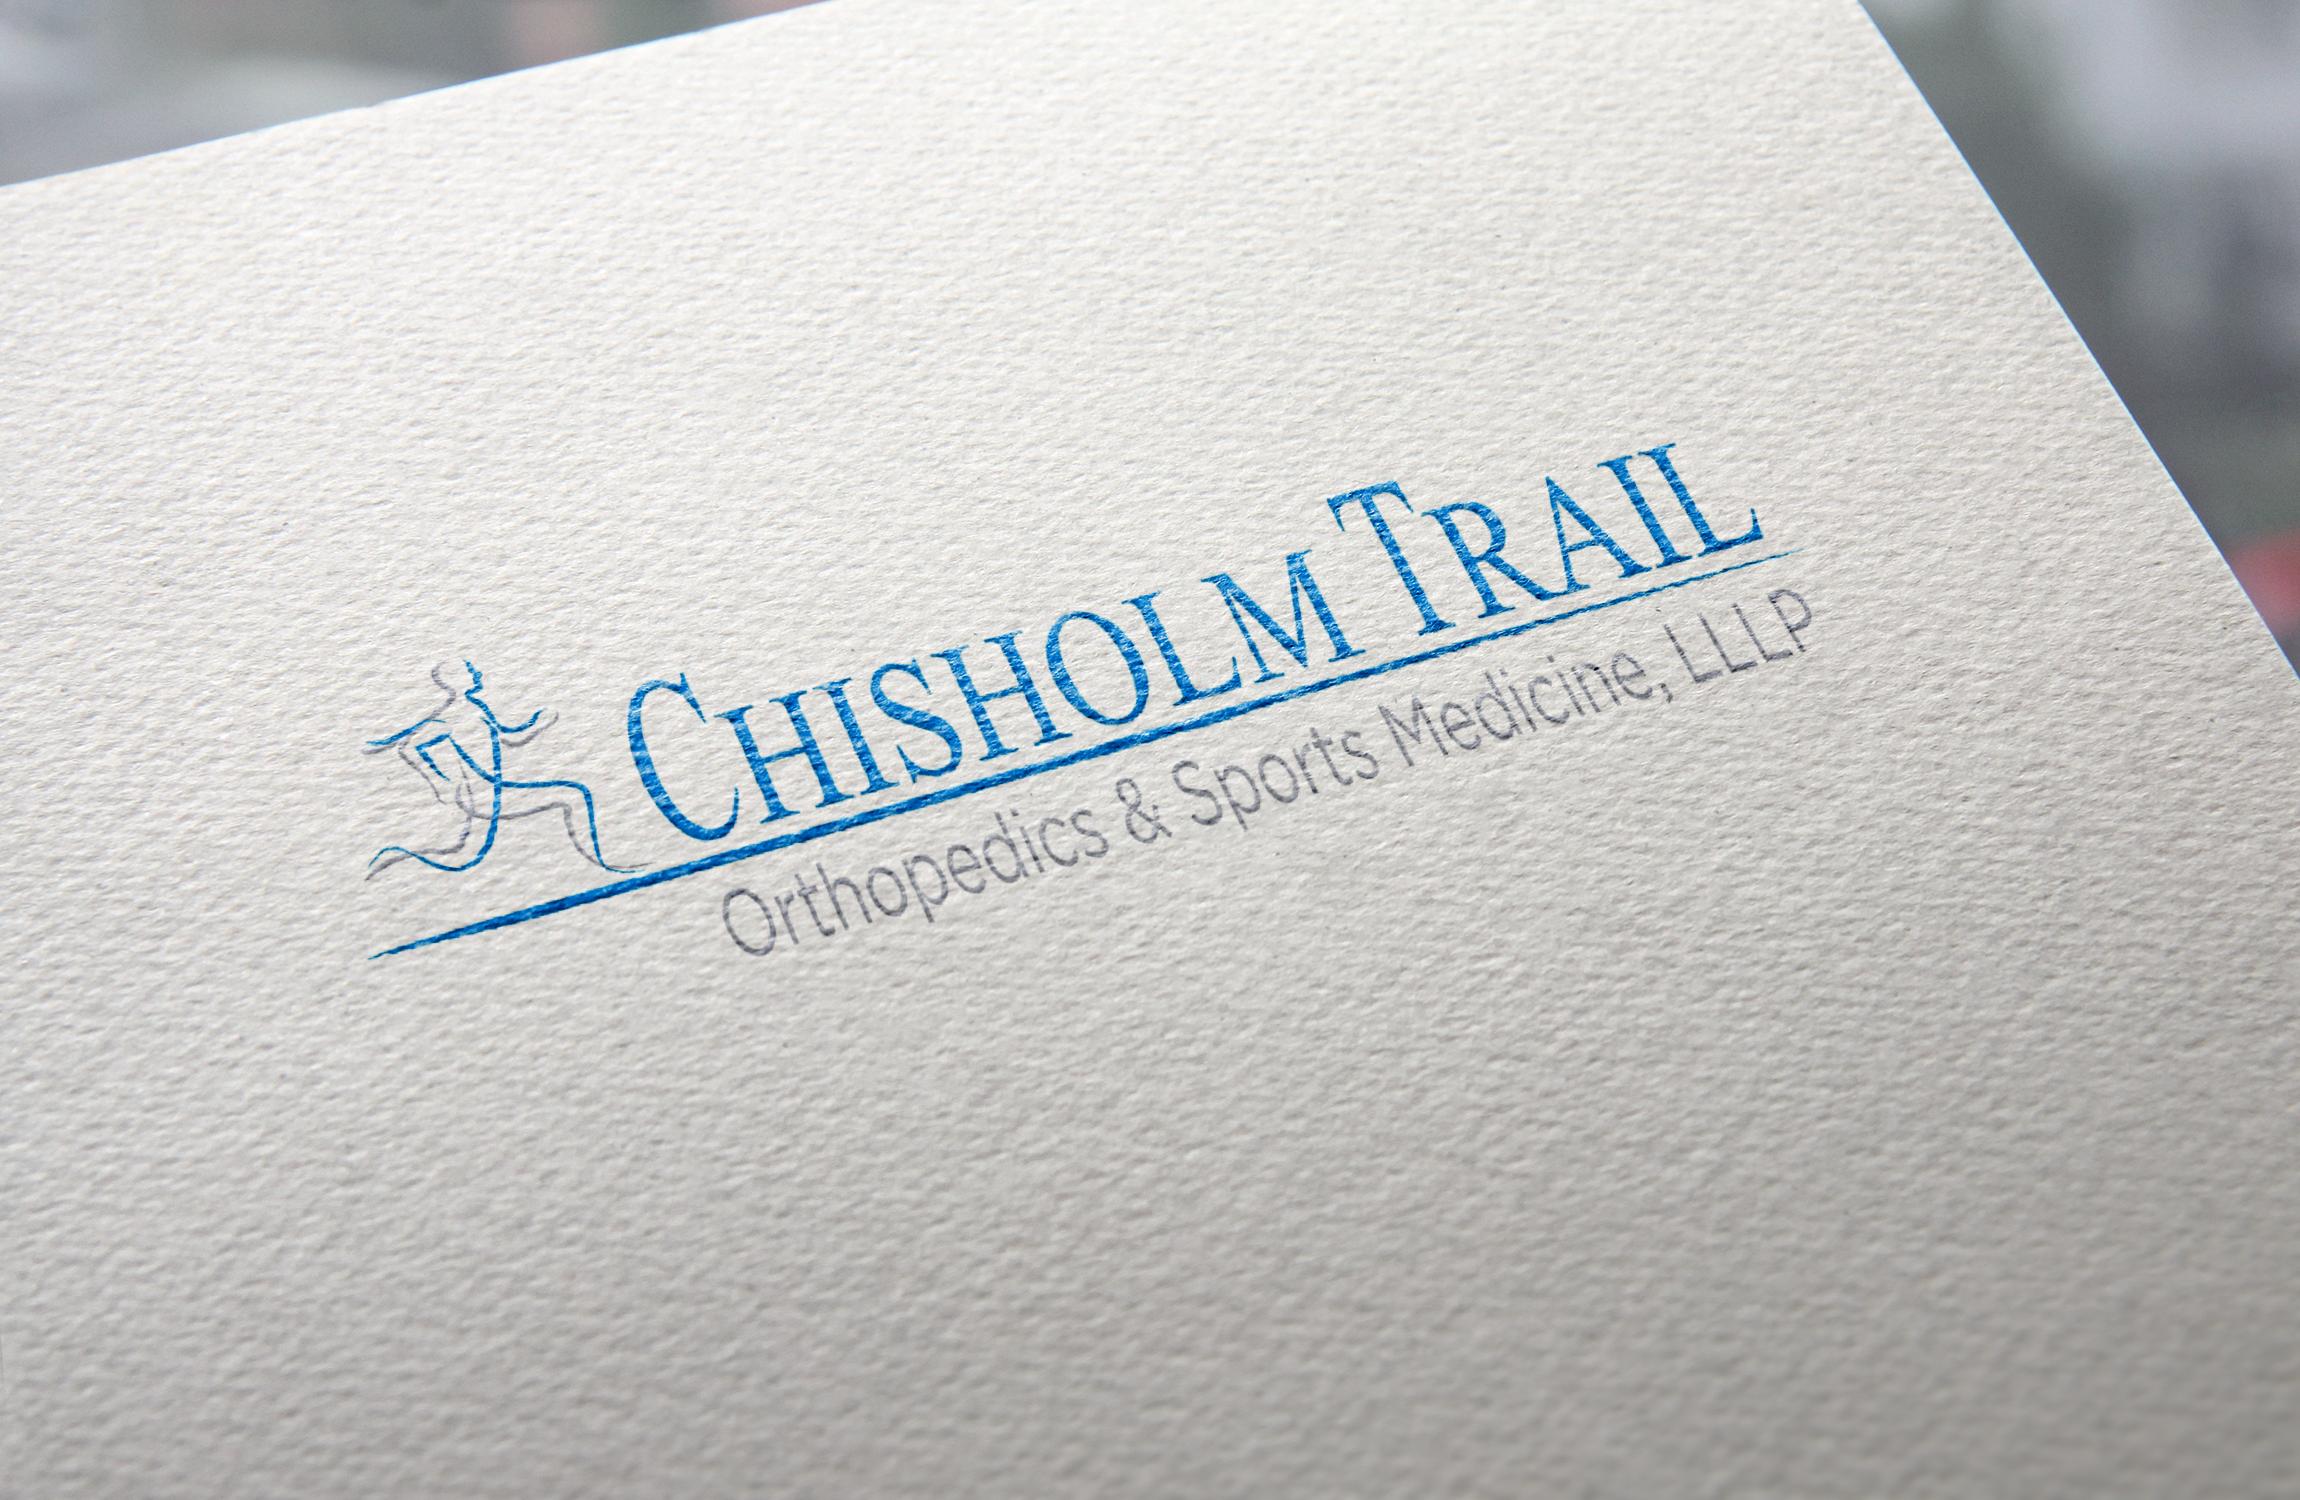 LOGO l Chisholm Trail